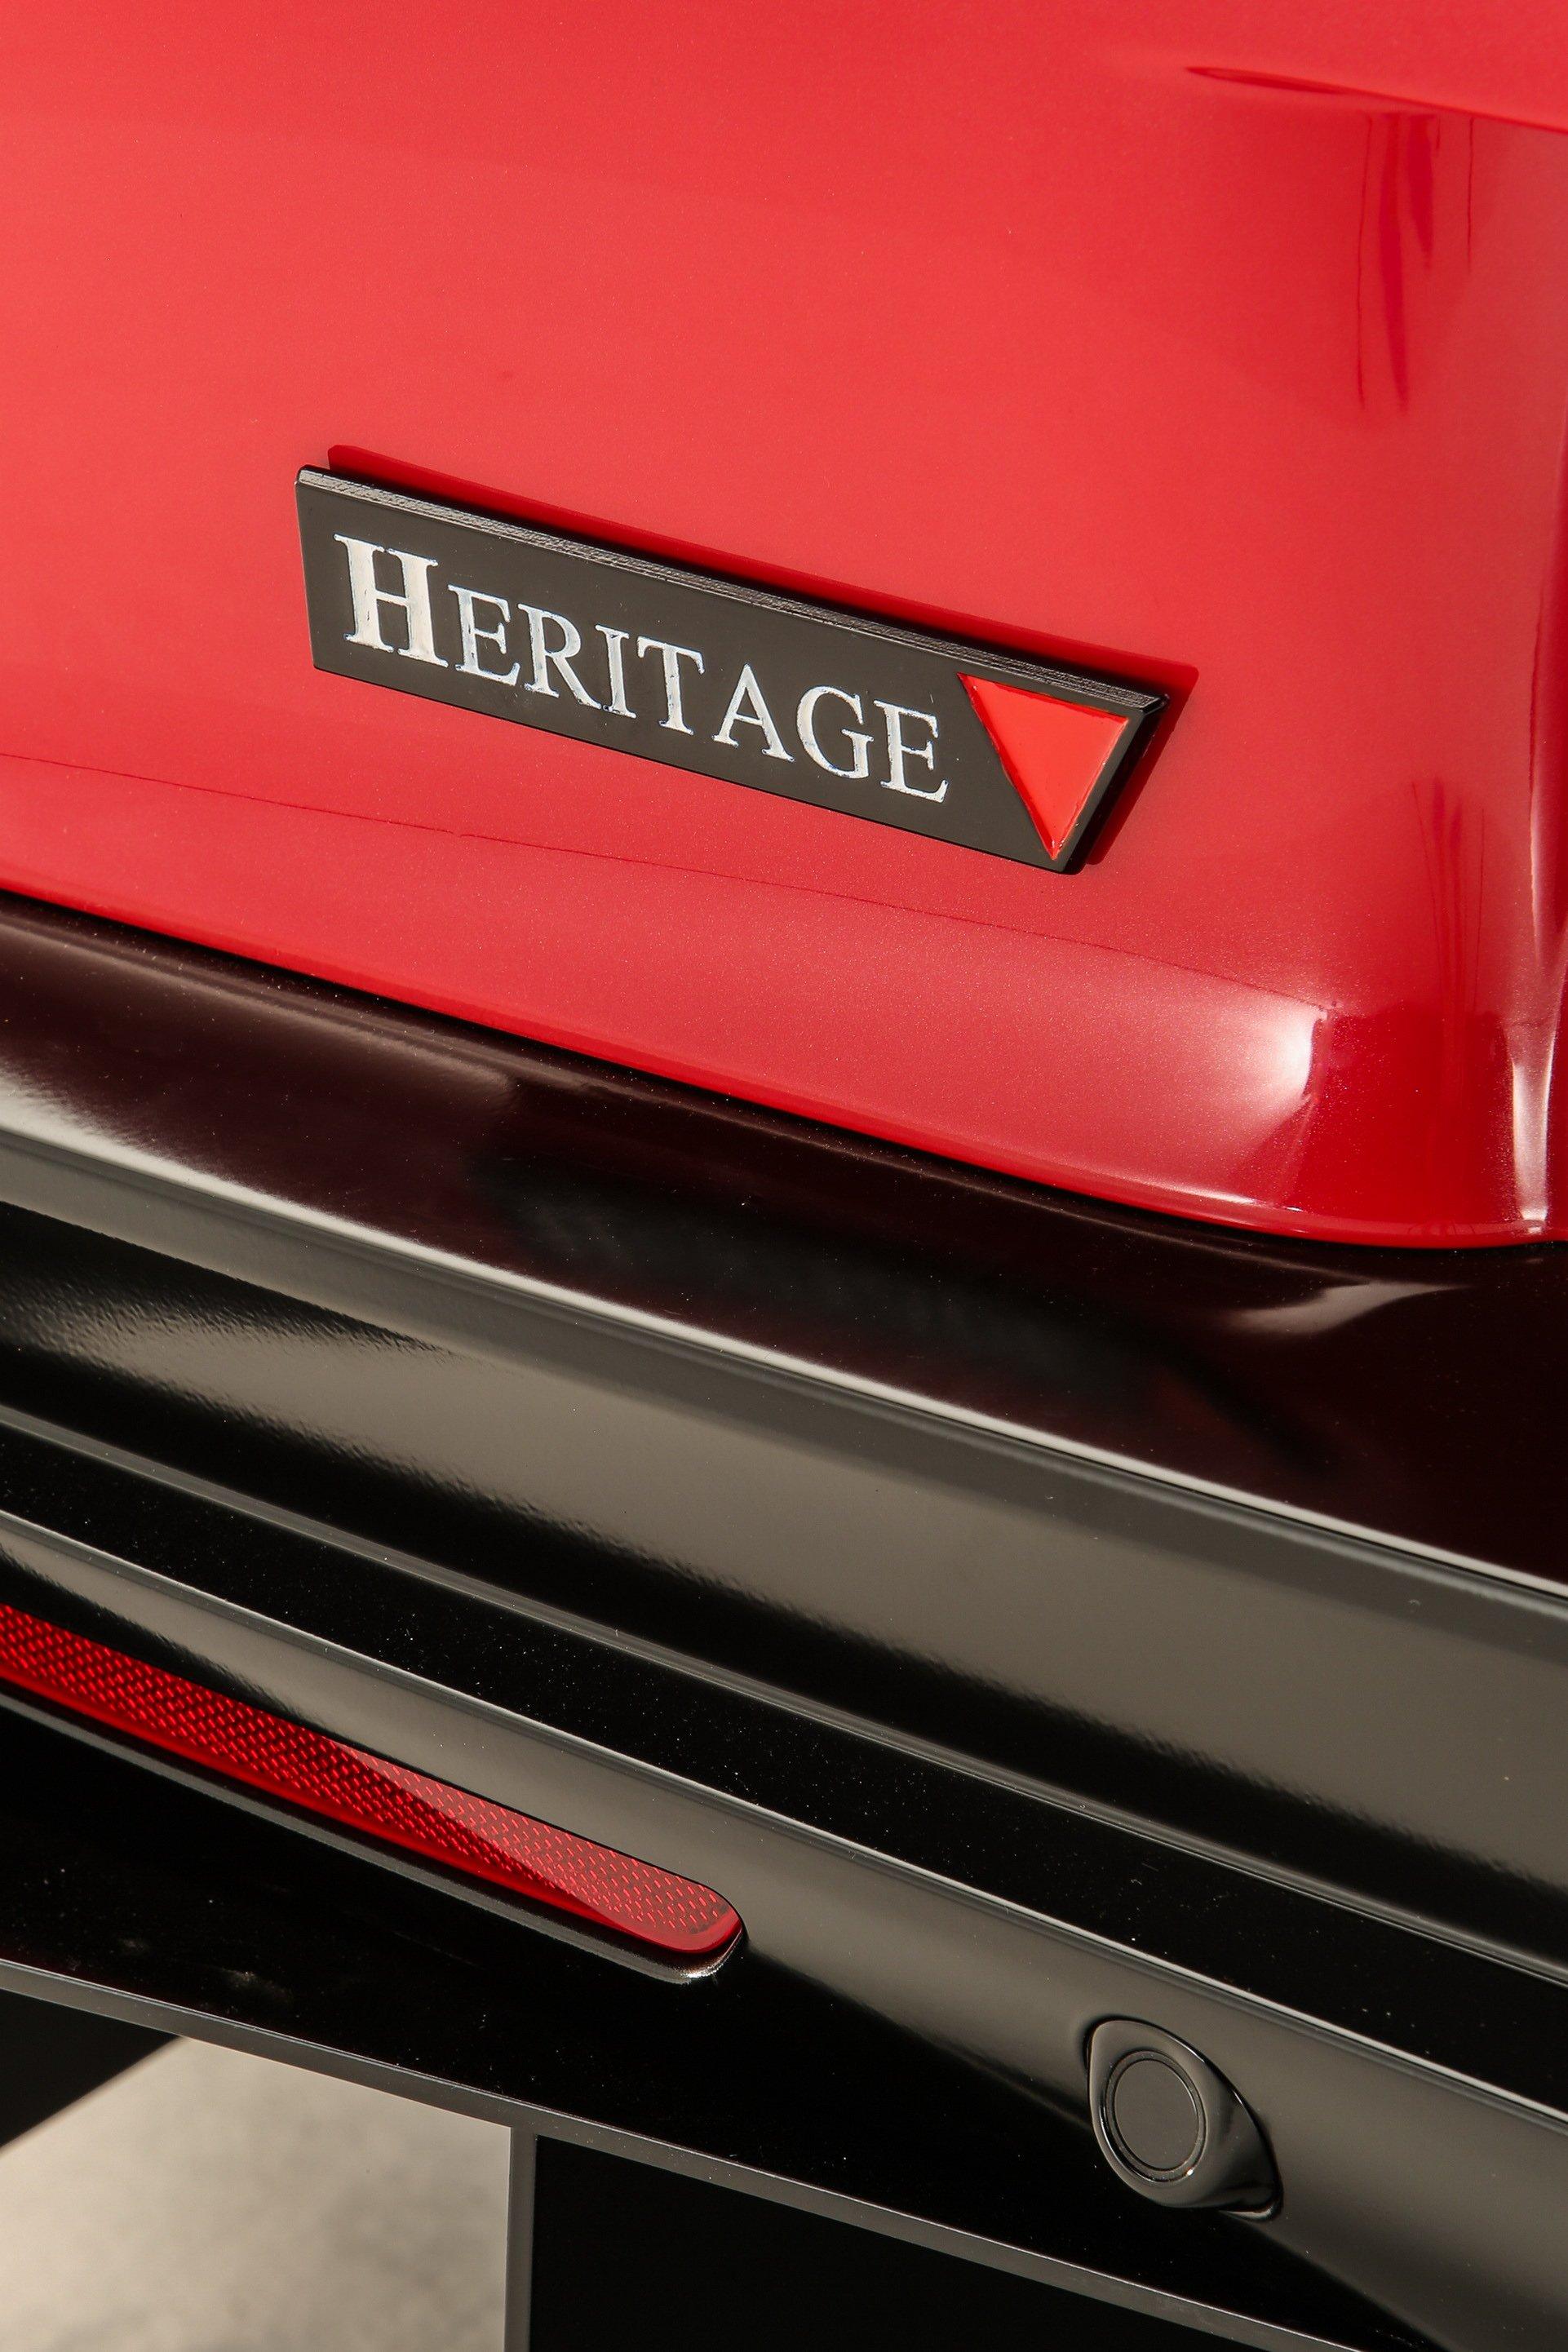 2020-Toyota-GR-Supra-Heritage-Edition-9